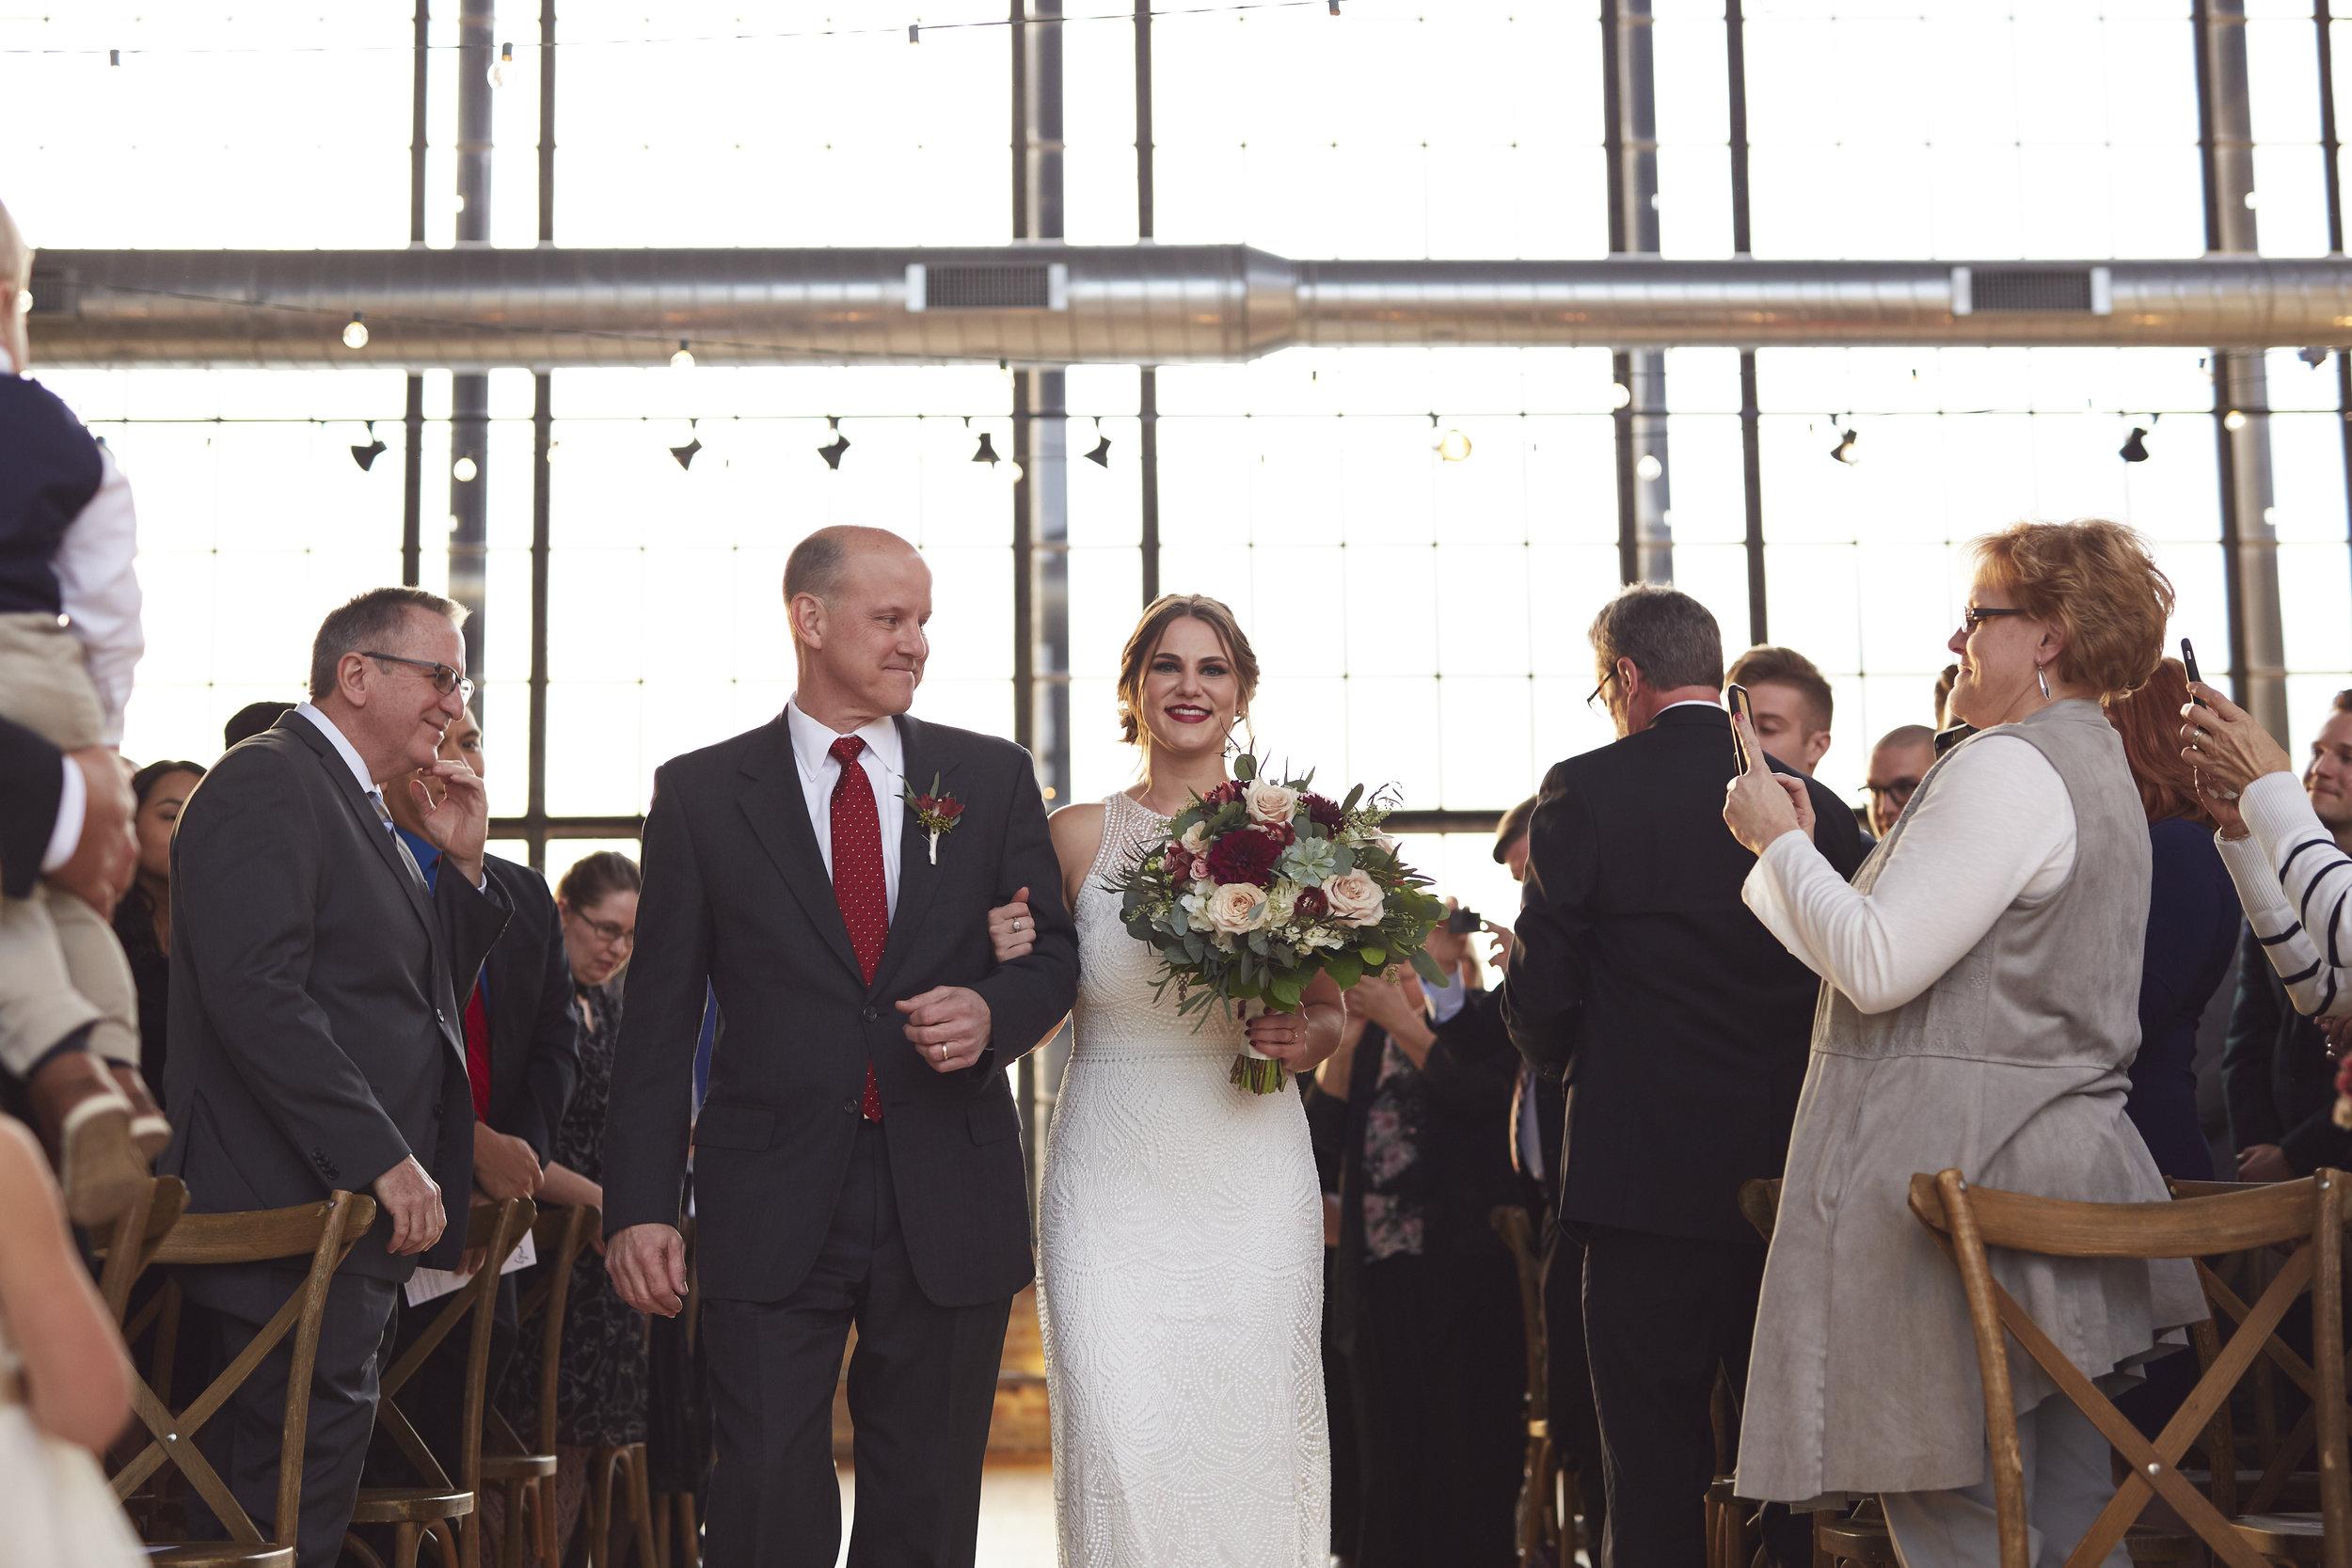 Jen & Ben Wedding - benromangphoto - 6I5A3580.jpg